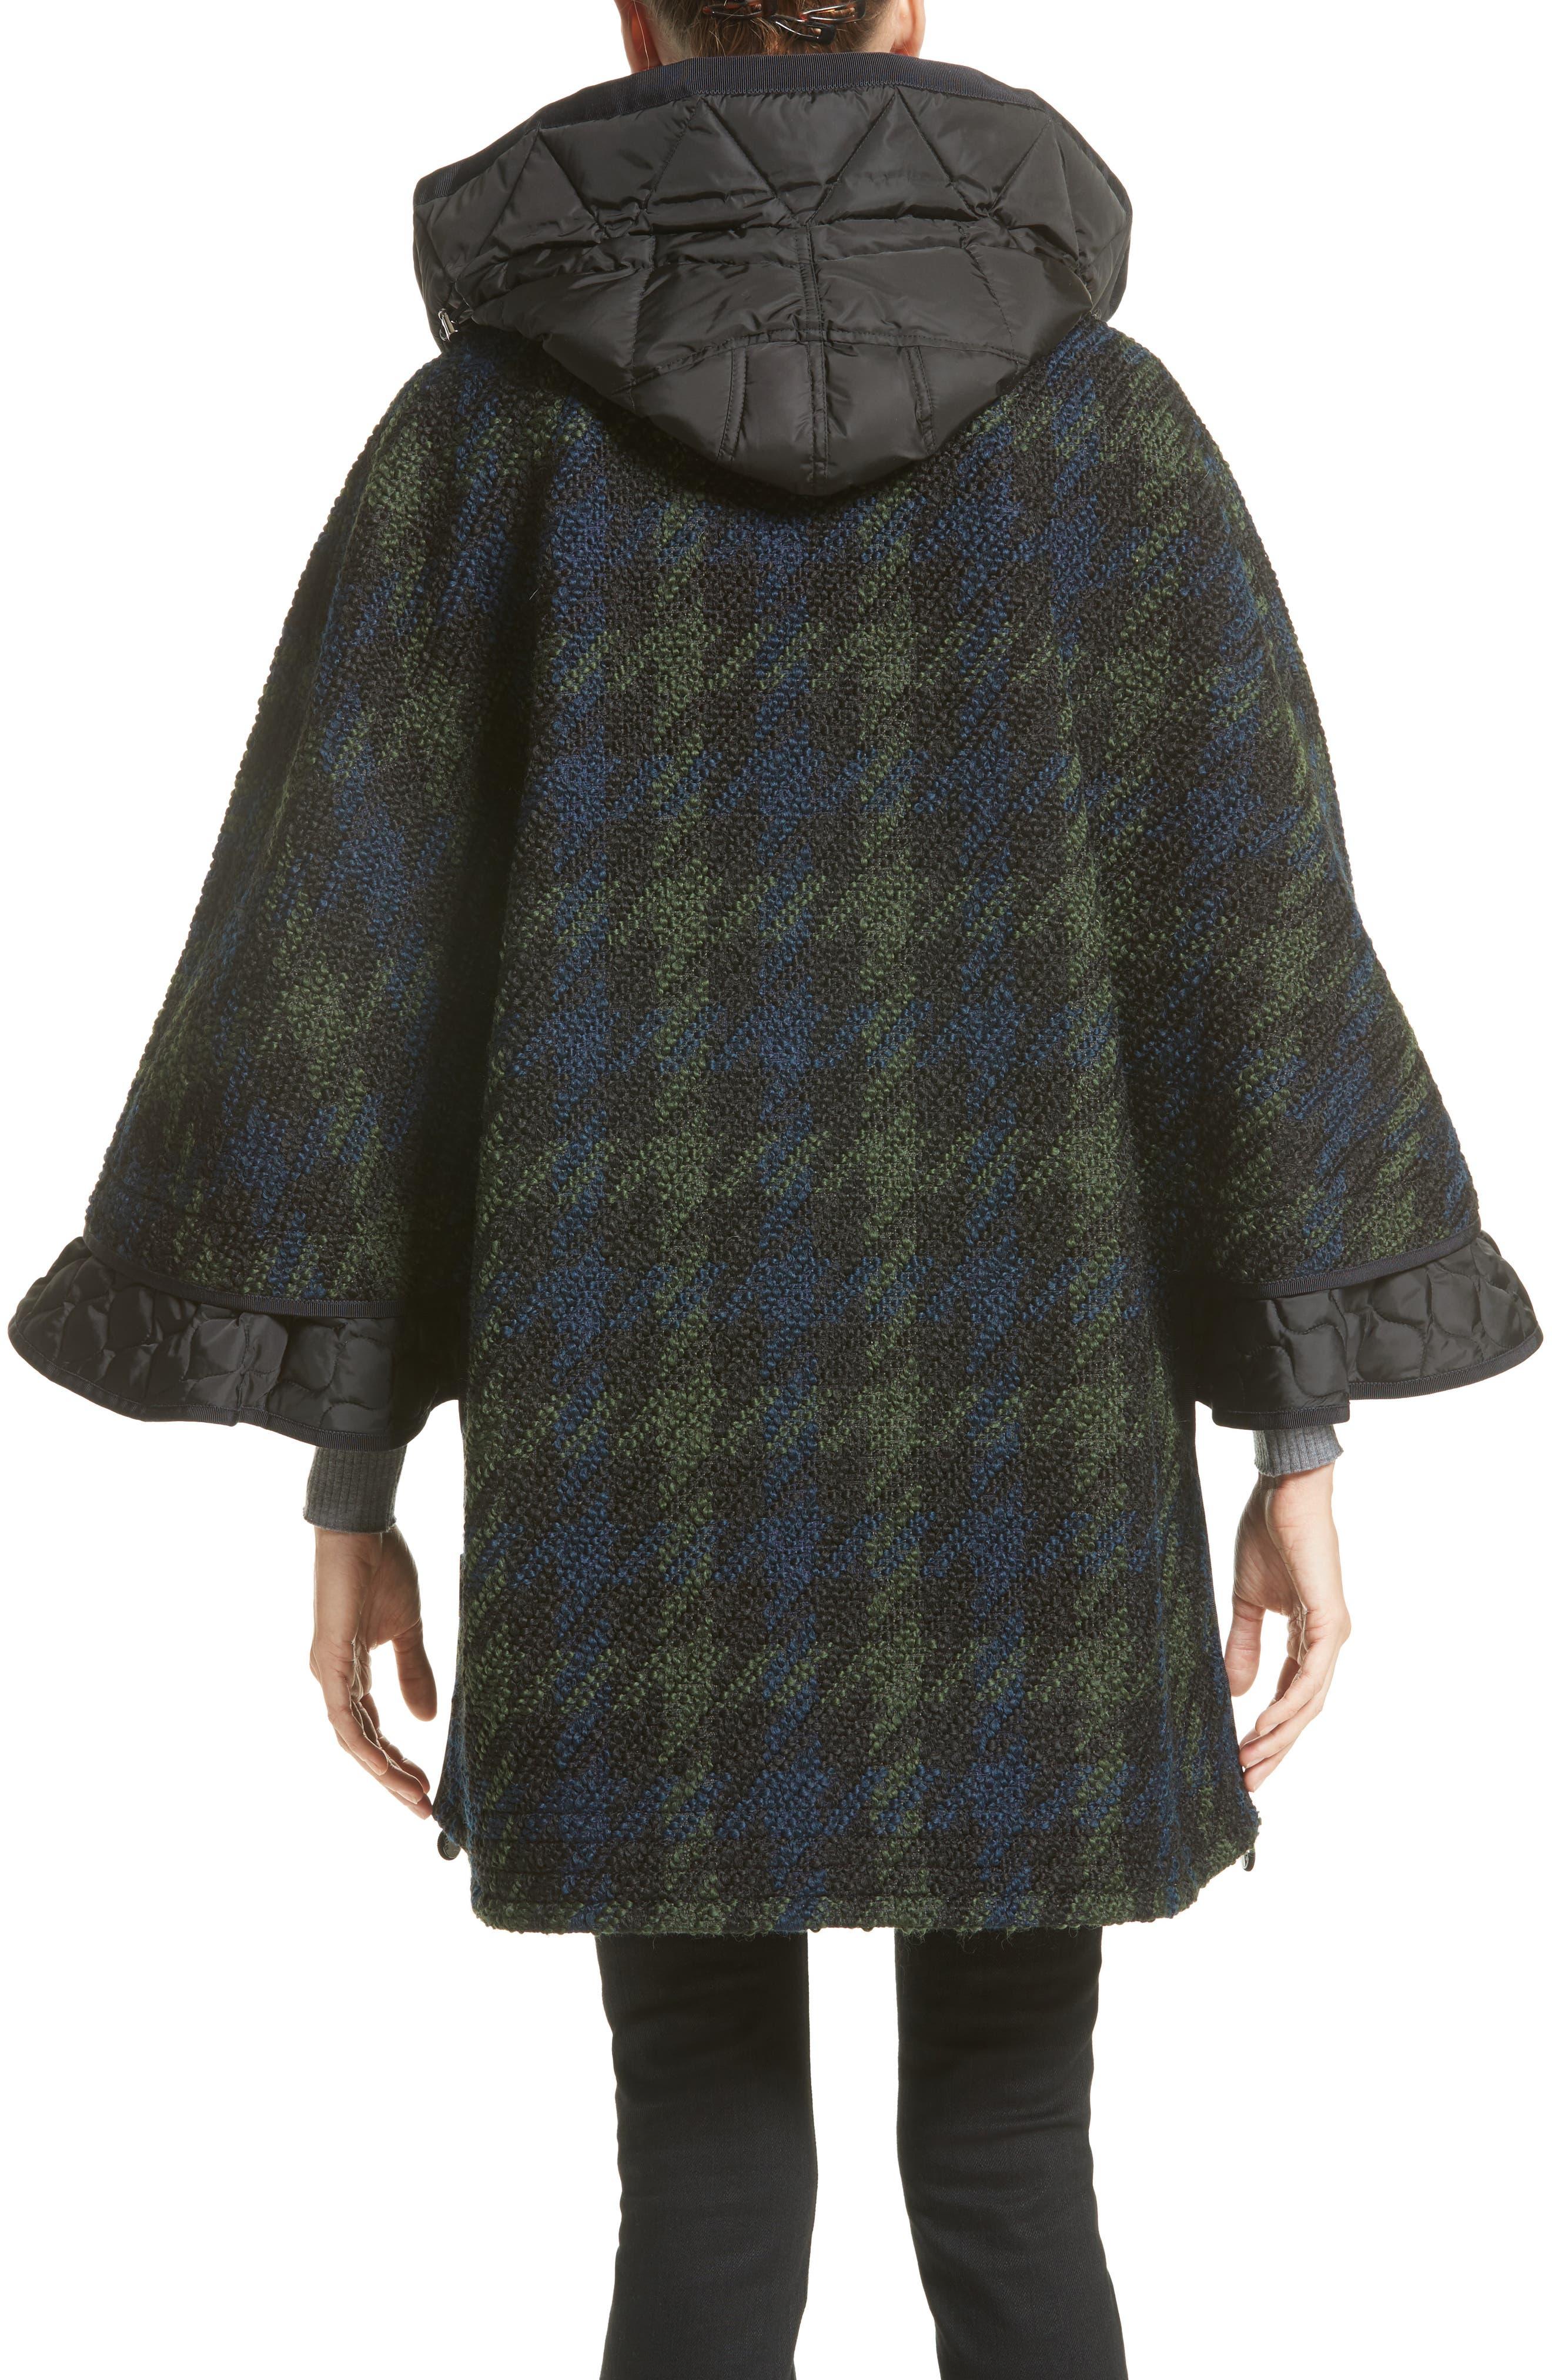 Euphrasie Wool Blend Houndstooth Coat,                             Alternate thumbnail 4, color,